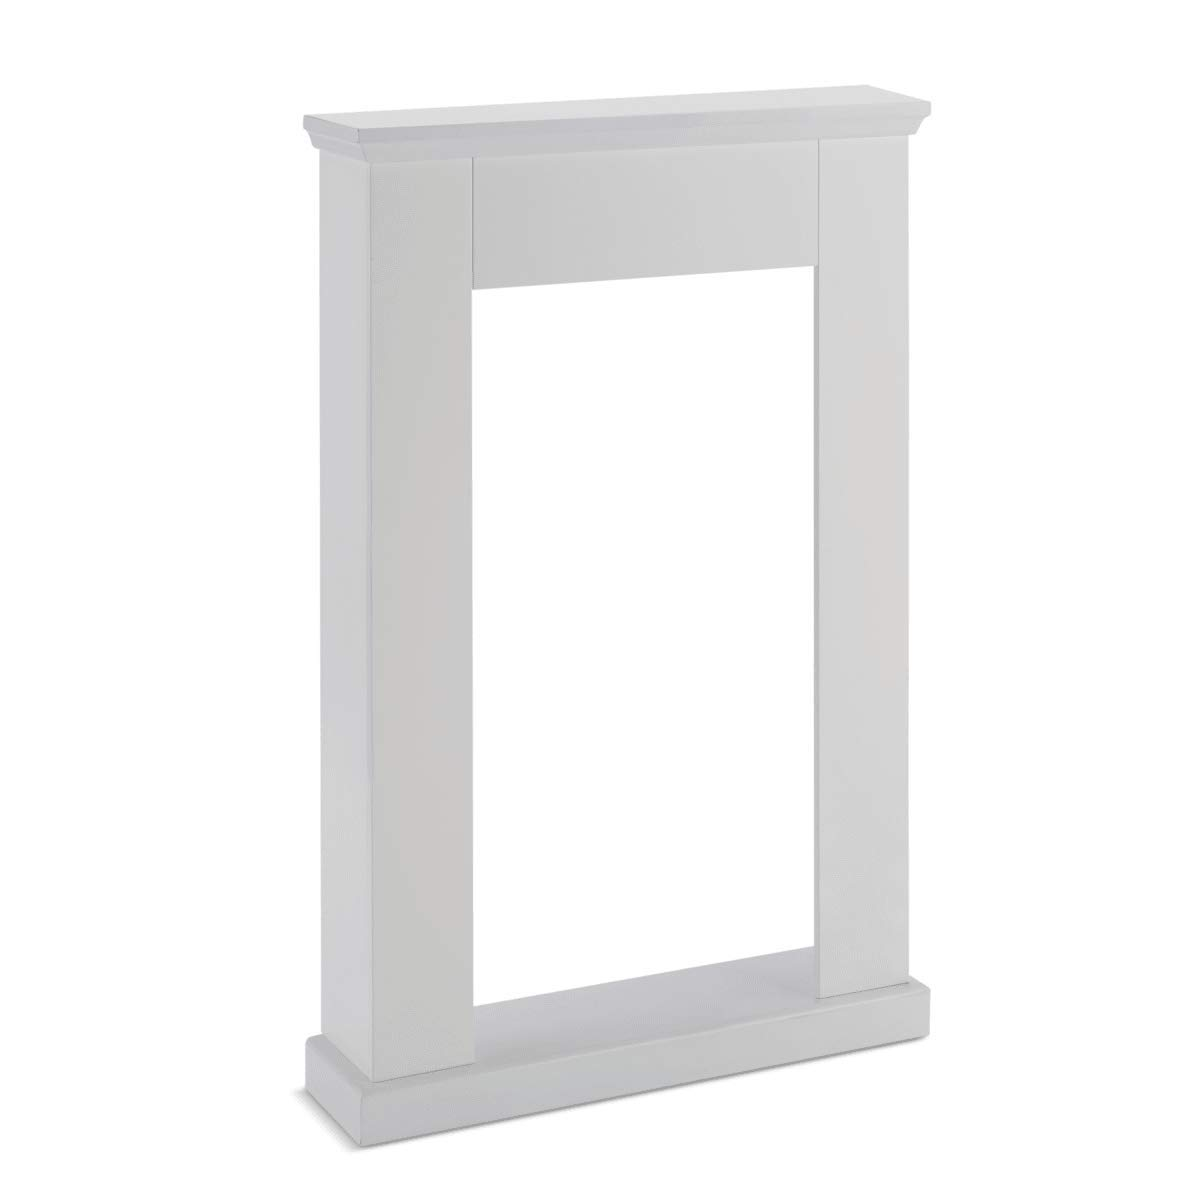 Kaminumrandung Konsole Landhausstil Weiß ca. 70 x 20 x 110, 5 cm Weiß - Grau 5 cm Weiß - Grau PureDay